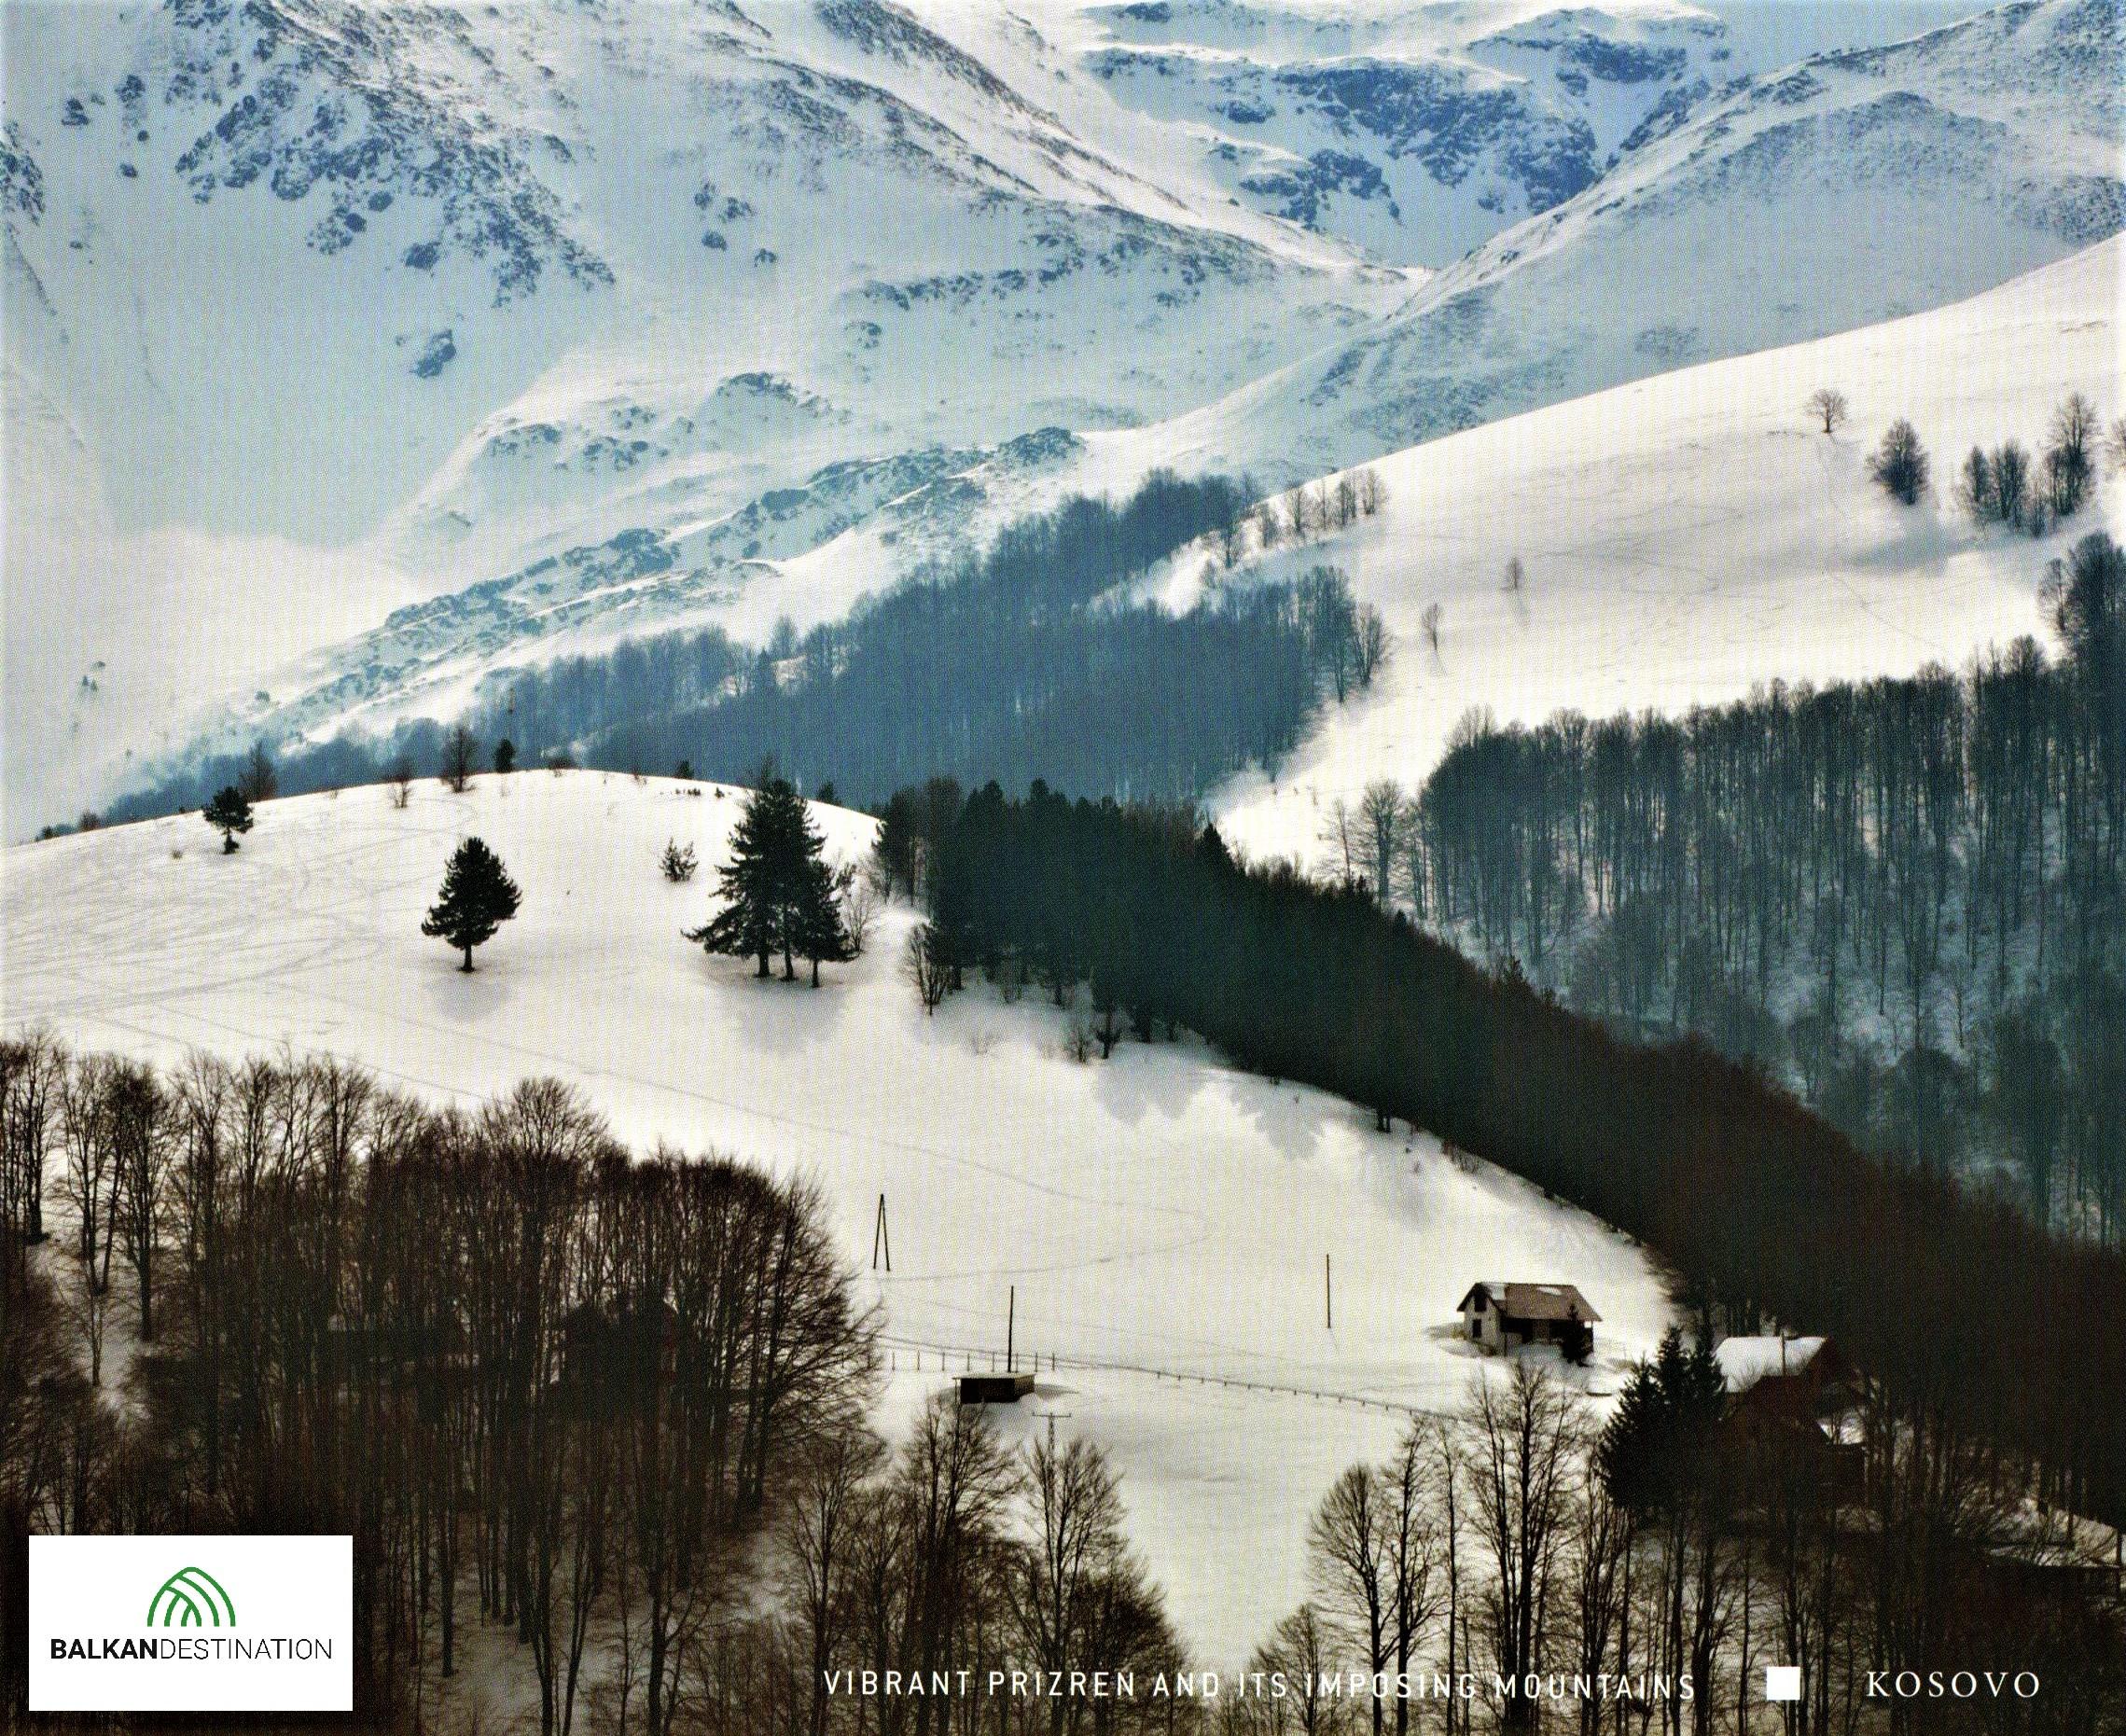 sharri mountains kosovo balkandestination